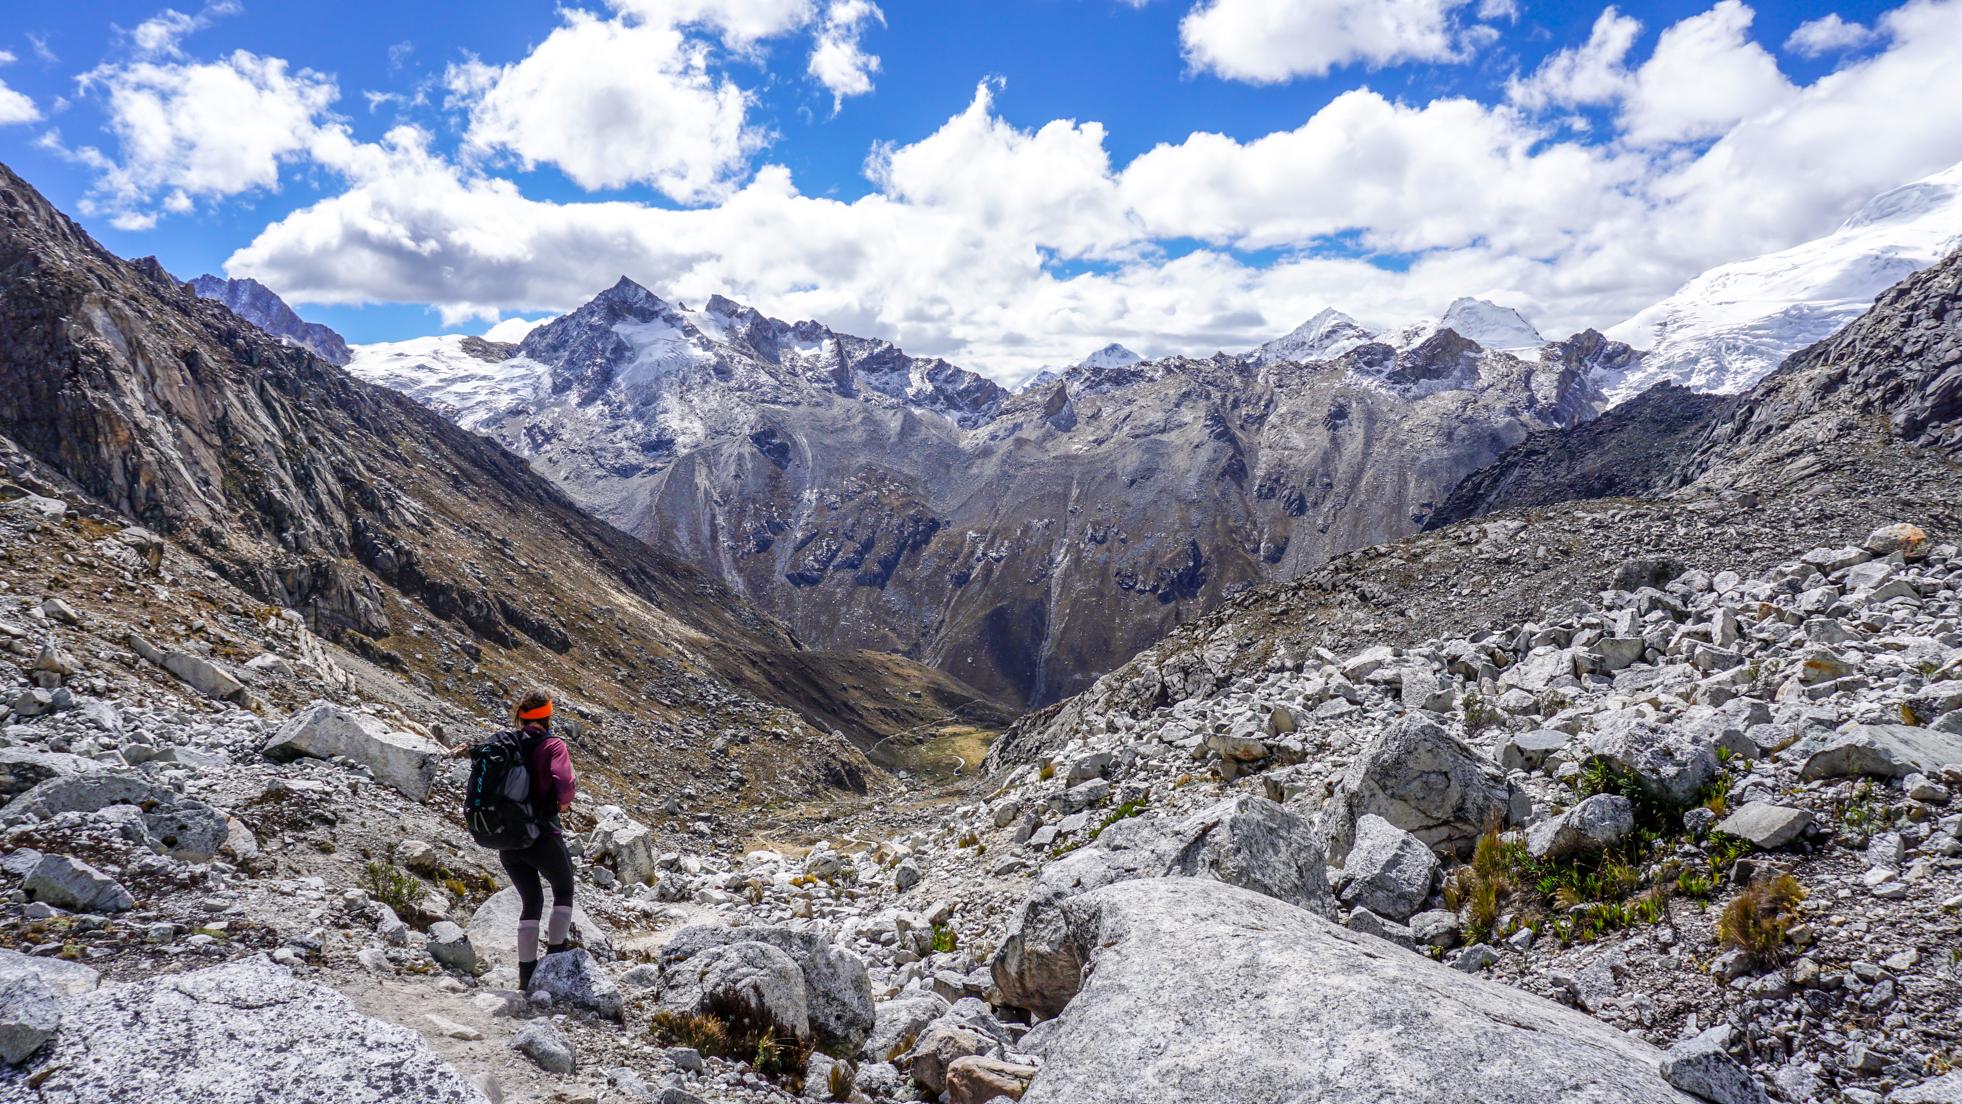 Najpiękniejsza dolina Cordillery Blanca: dolina Ishinki